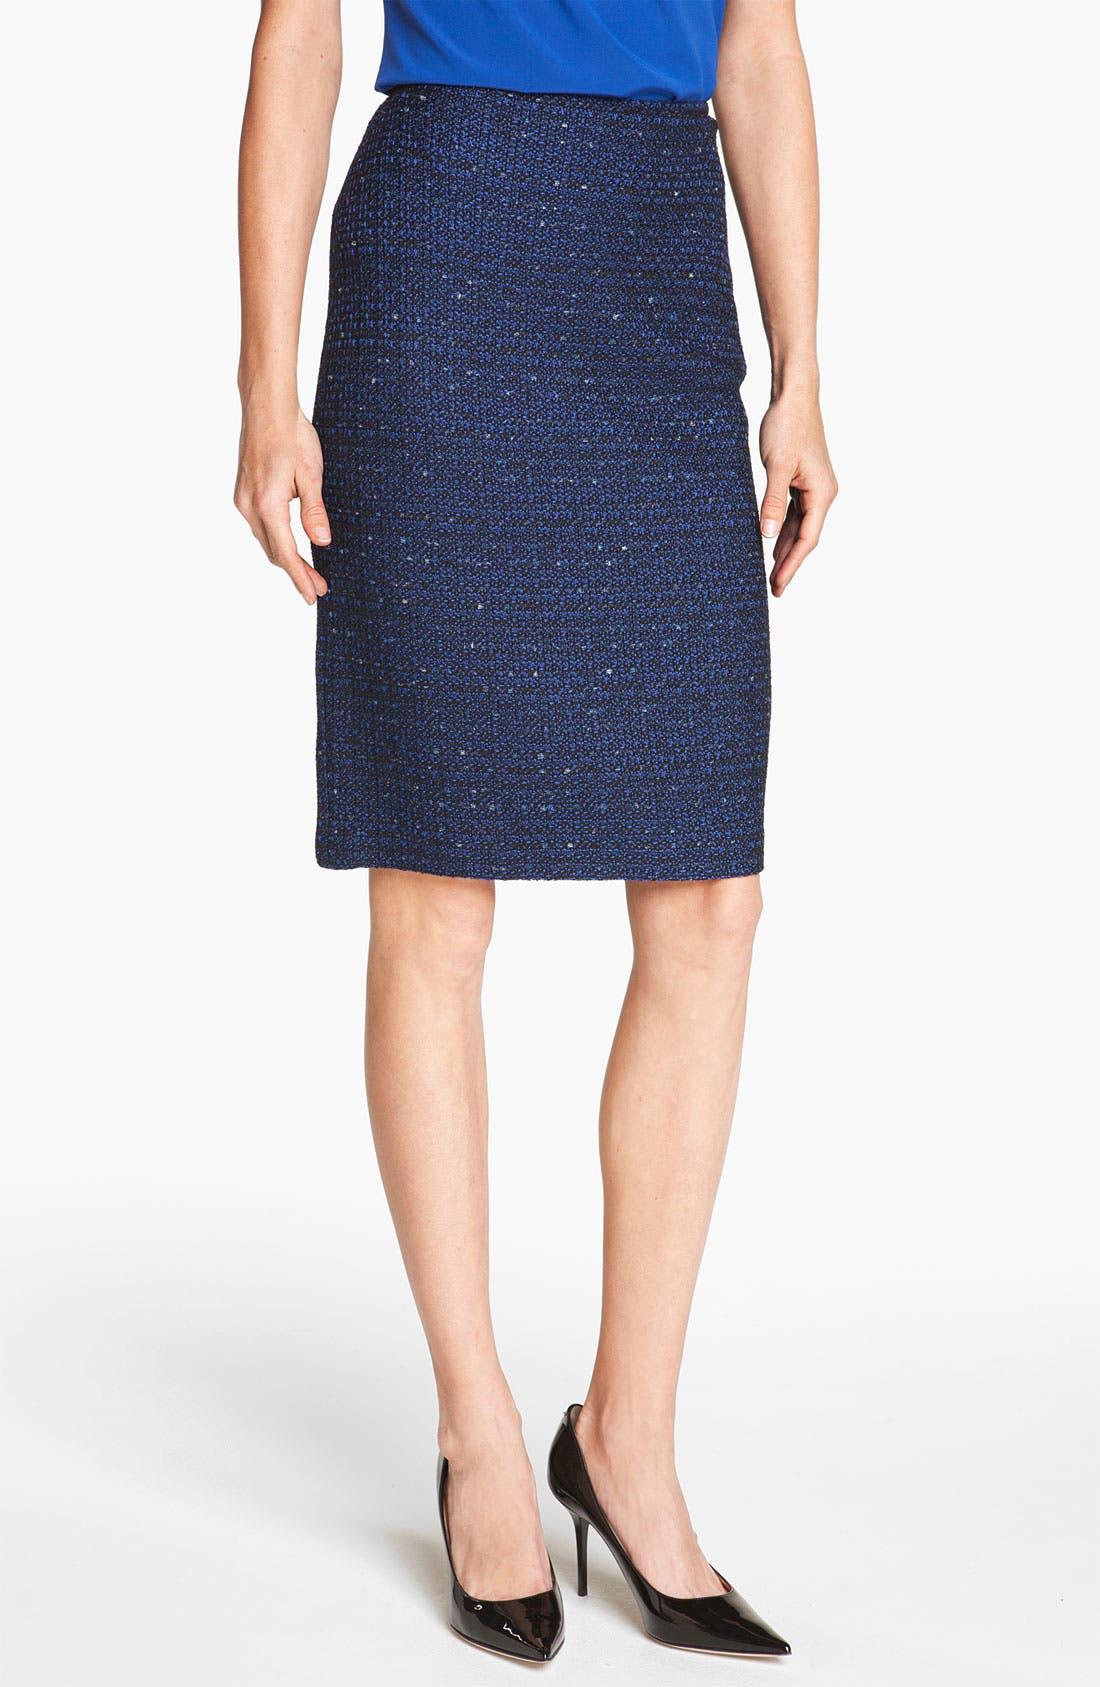 Main Image - St. John Collection Tweed Knit Pencil Skirt